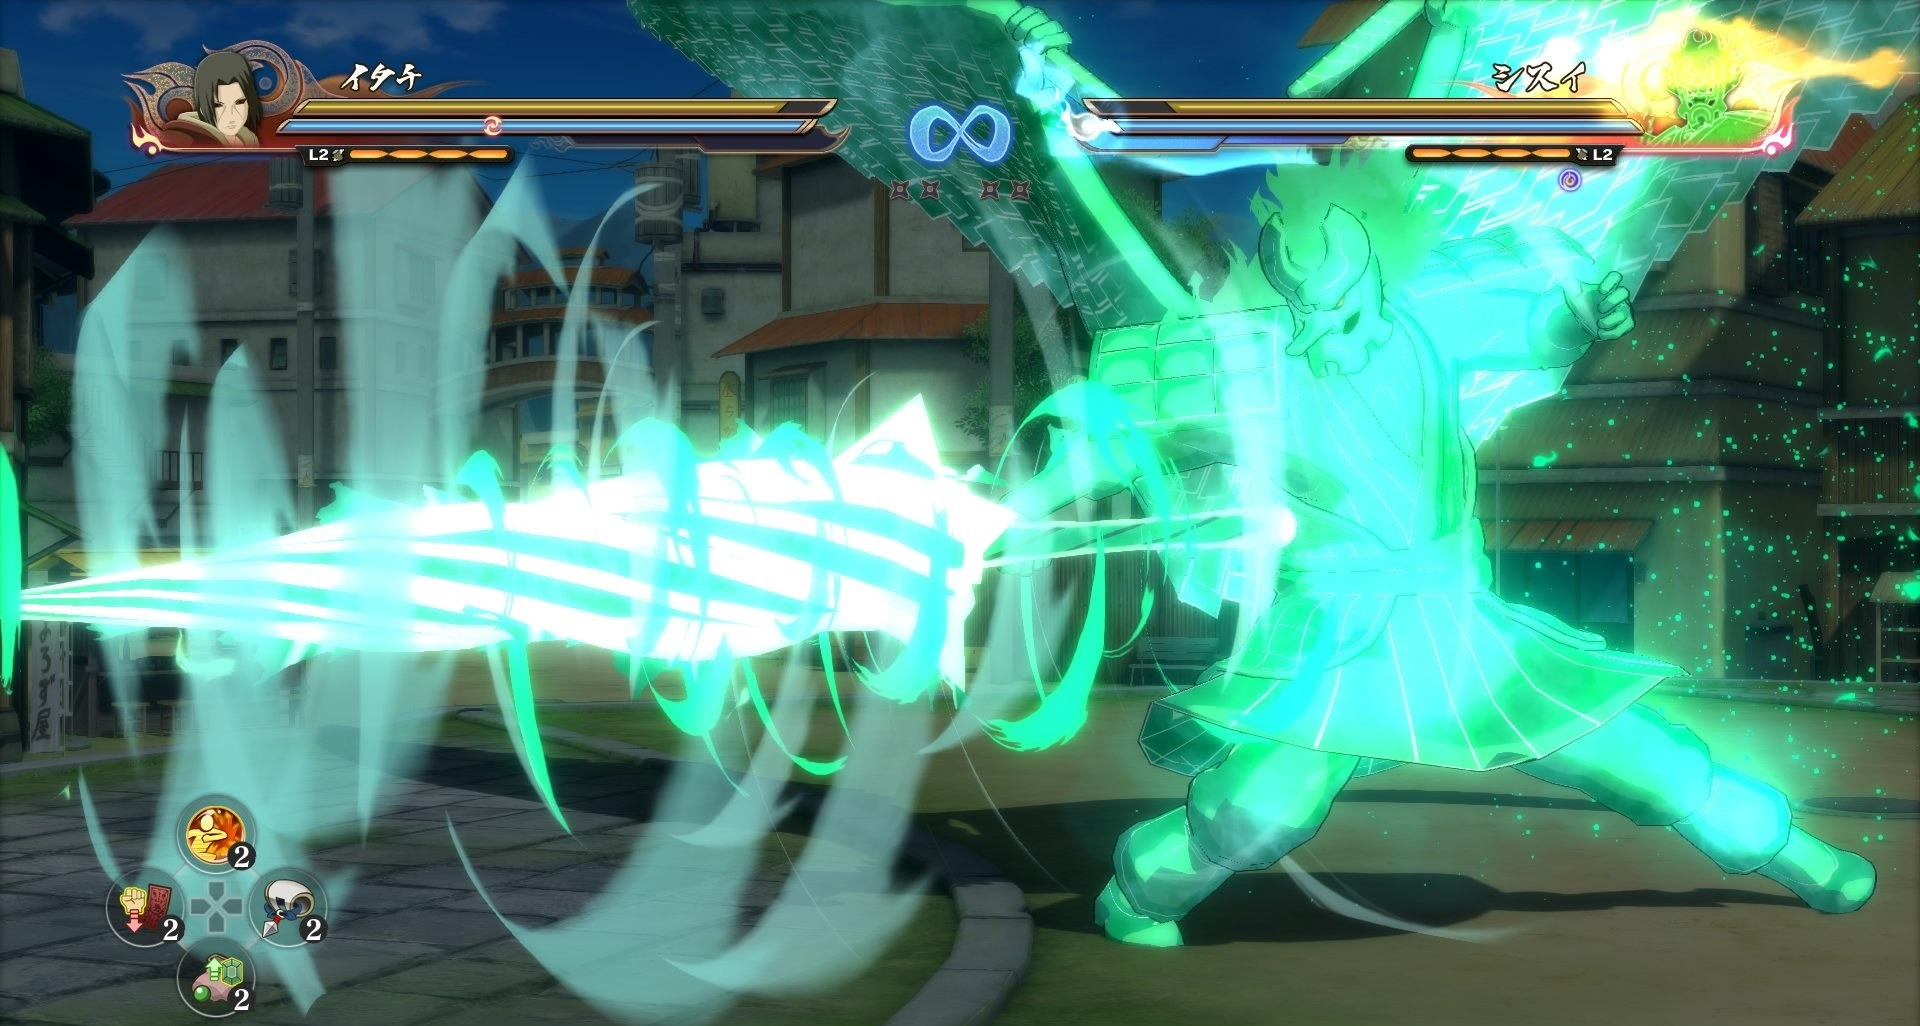 Naruto-Storm-4-6 Naruto Storm 4:Mükemmel Susanoo Shisui ve Itachi Ekran Görüntüleri